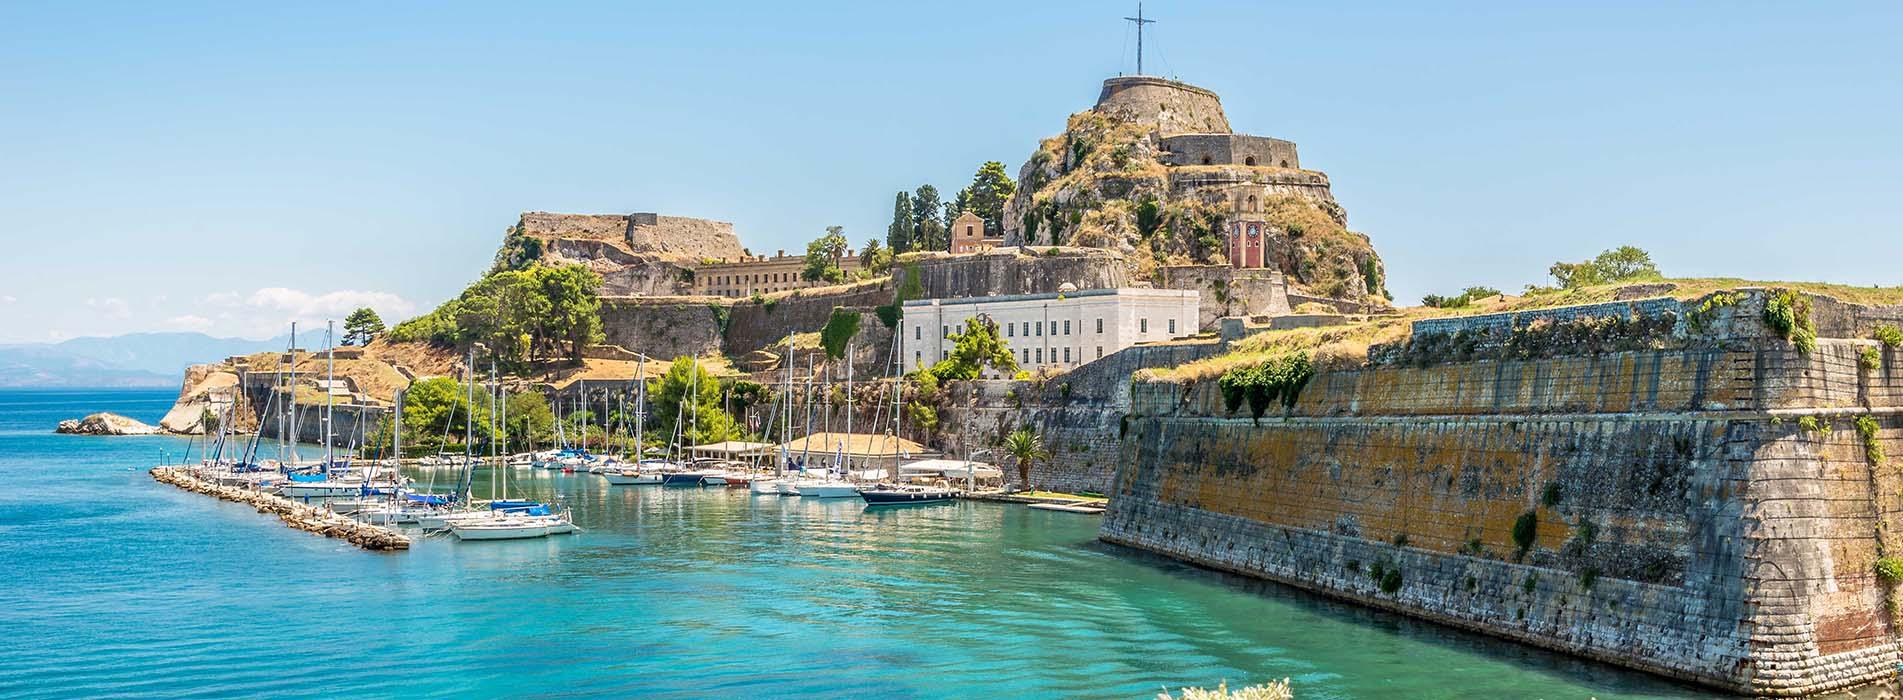 Greece - Corfu 5 (main)